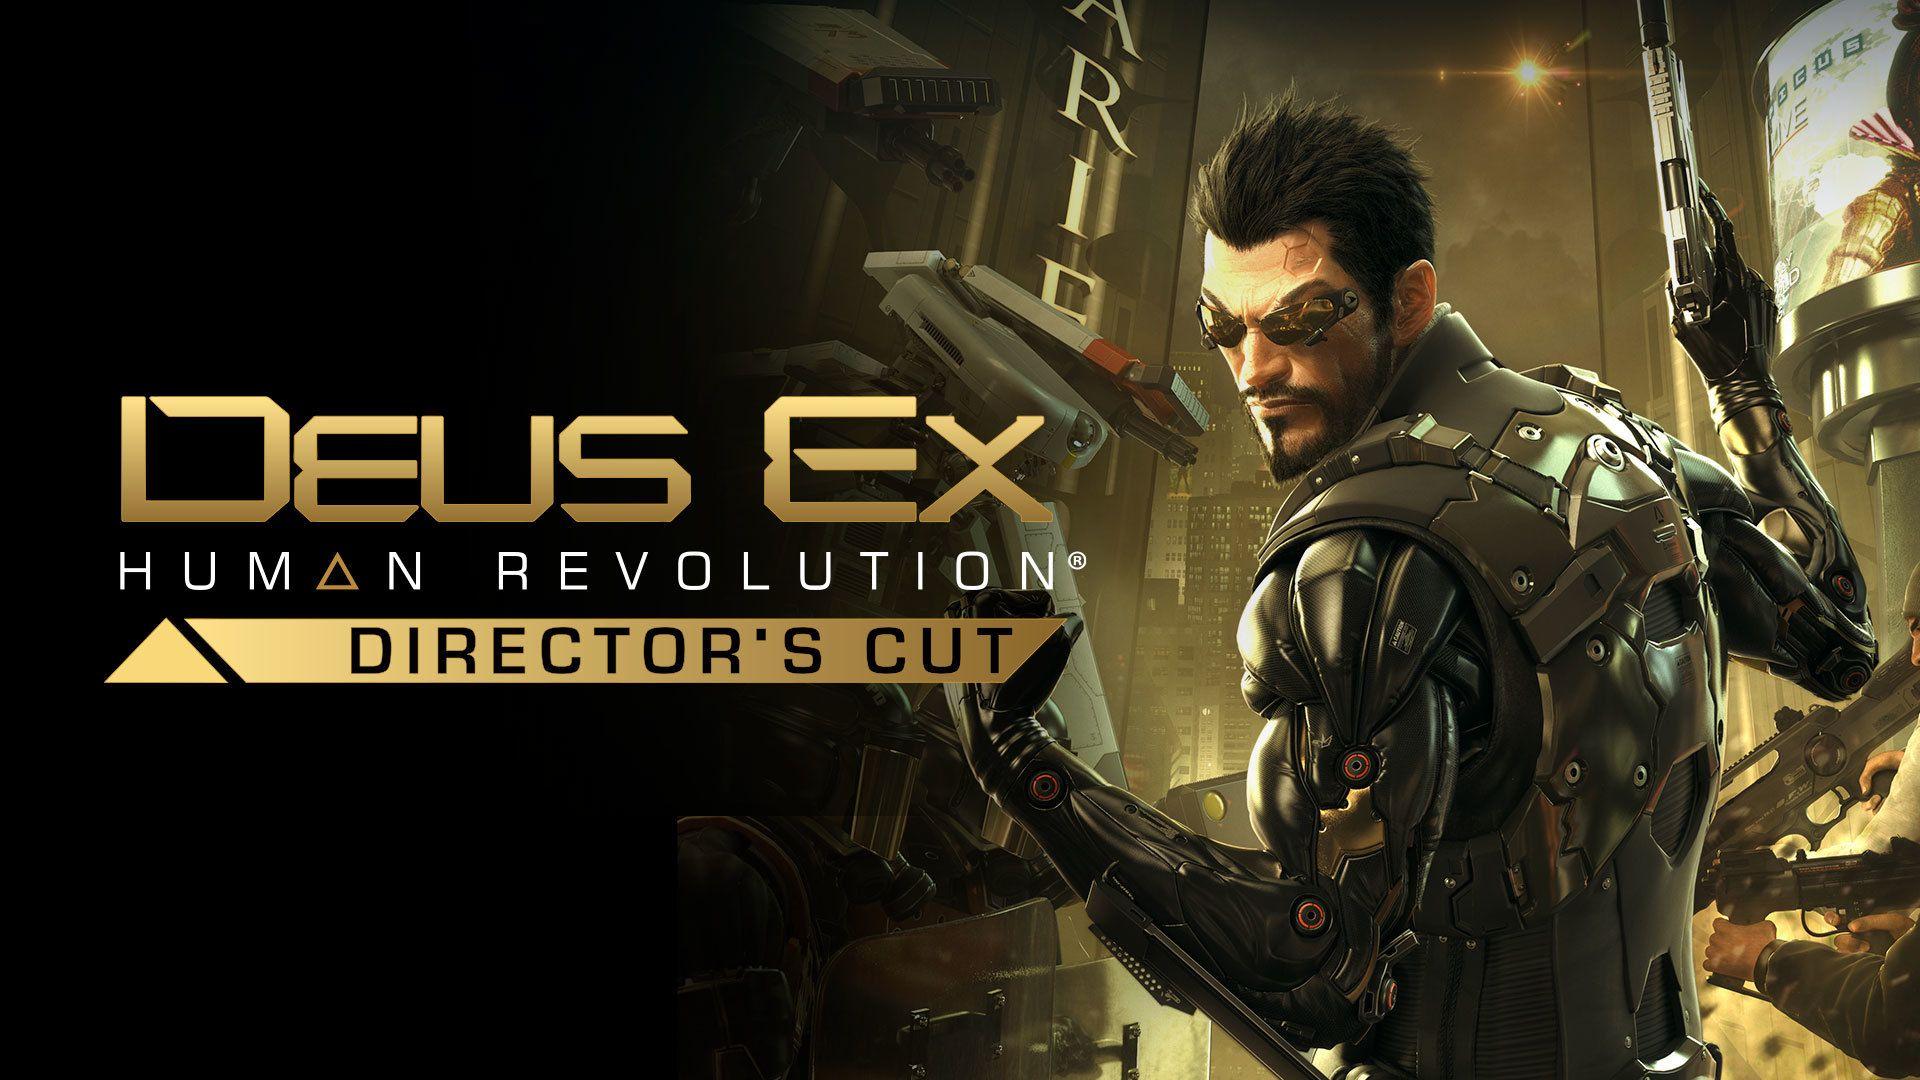 [Steam] Deus Ex: Human Revolution - Director's Cut (PC) - £1.66 @ GreenMan Gaming